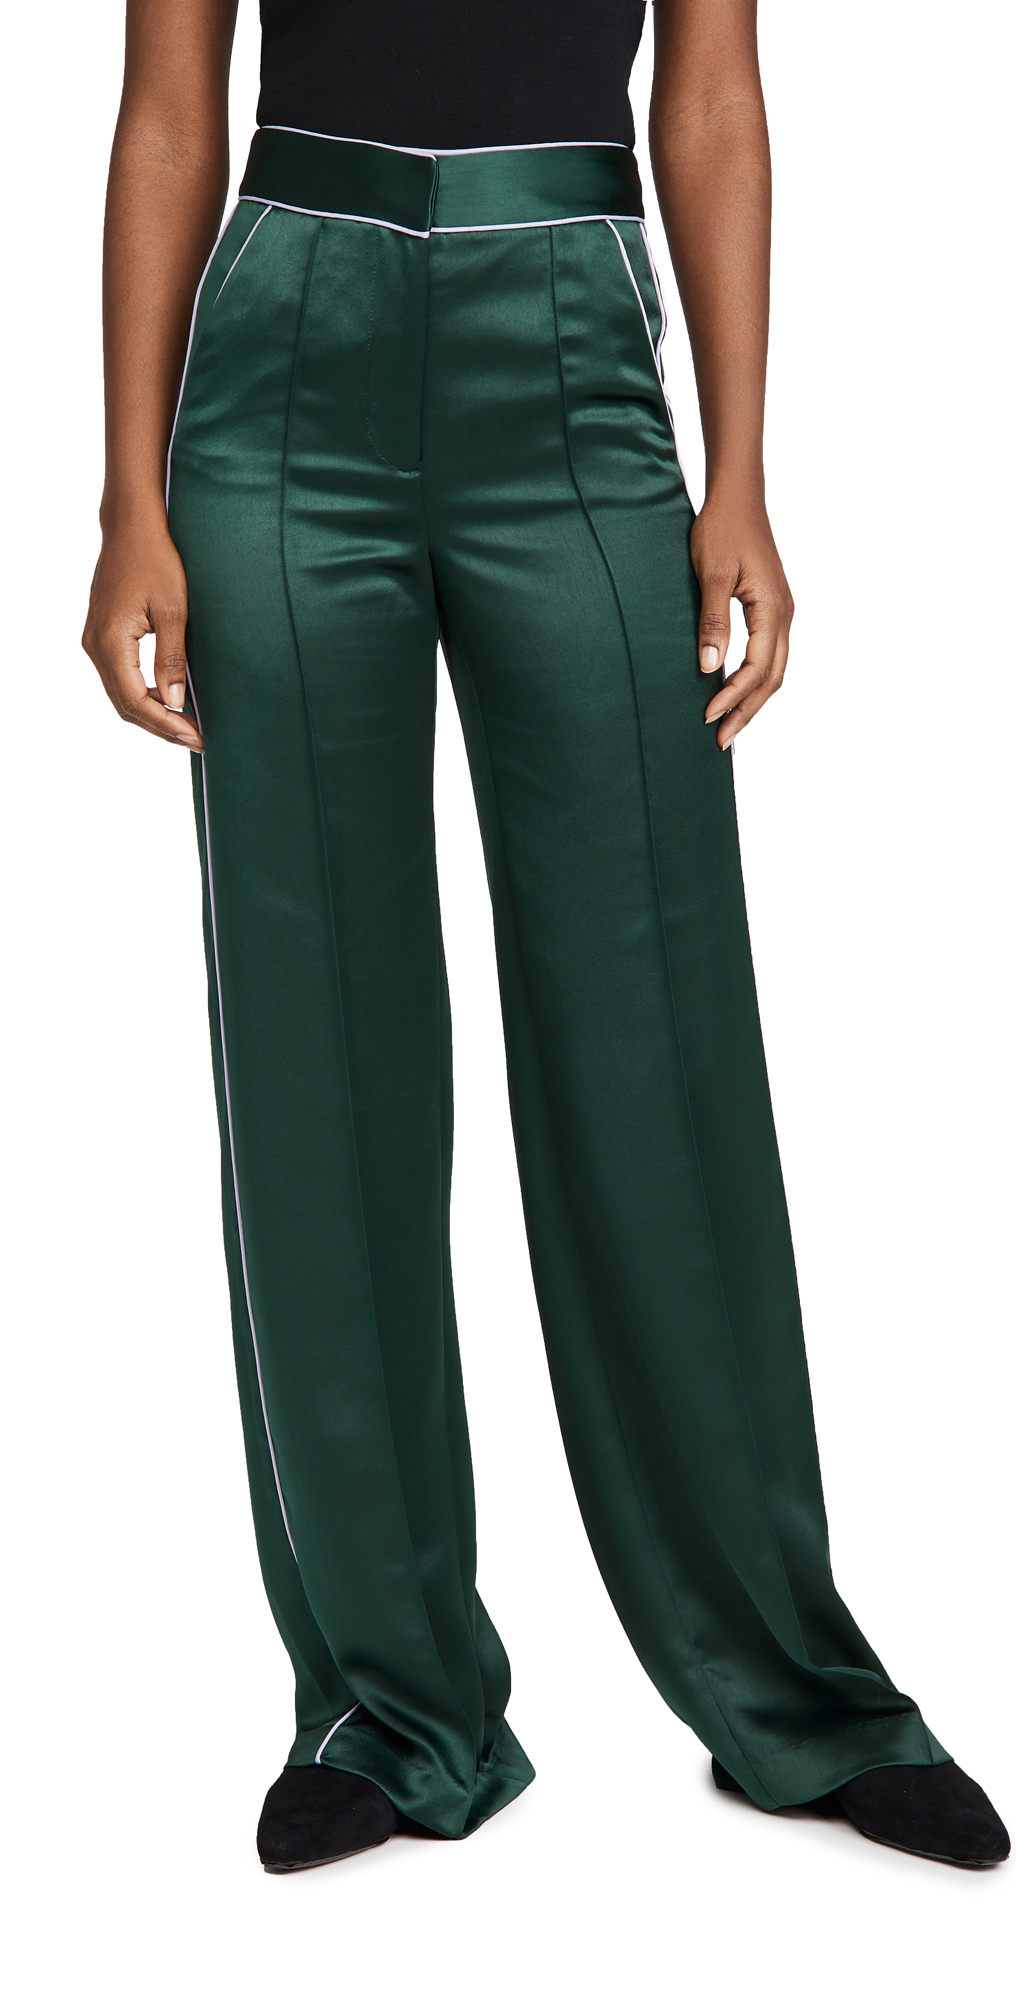 Veronica Beard Edia Pants